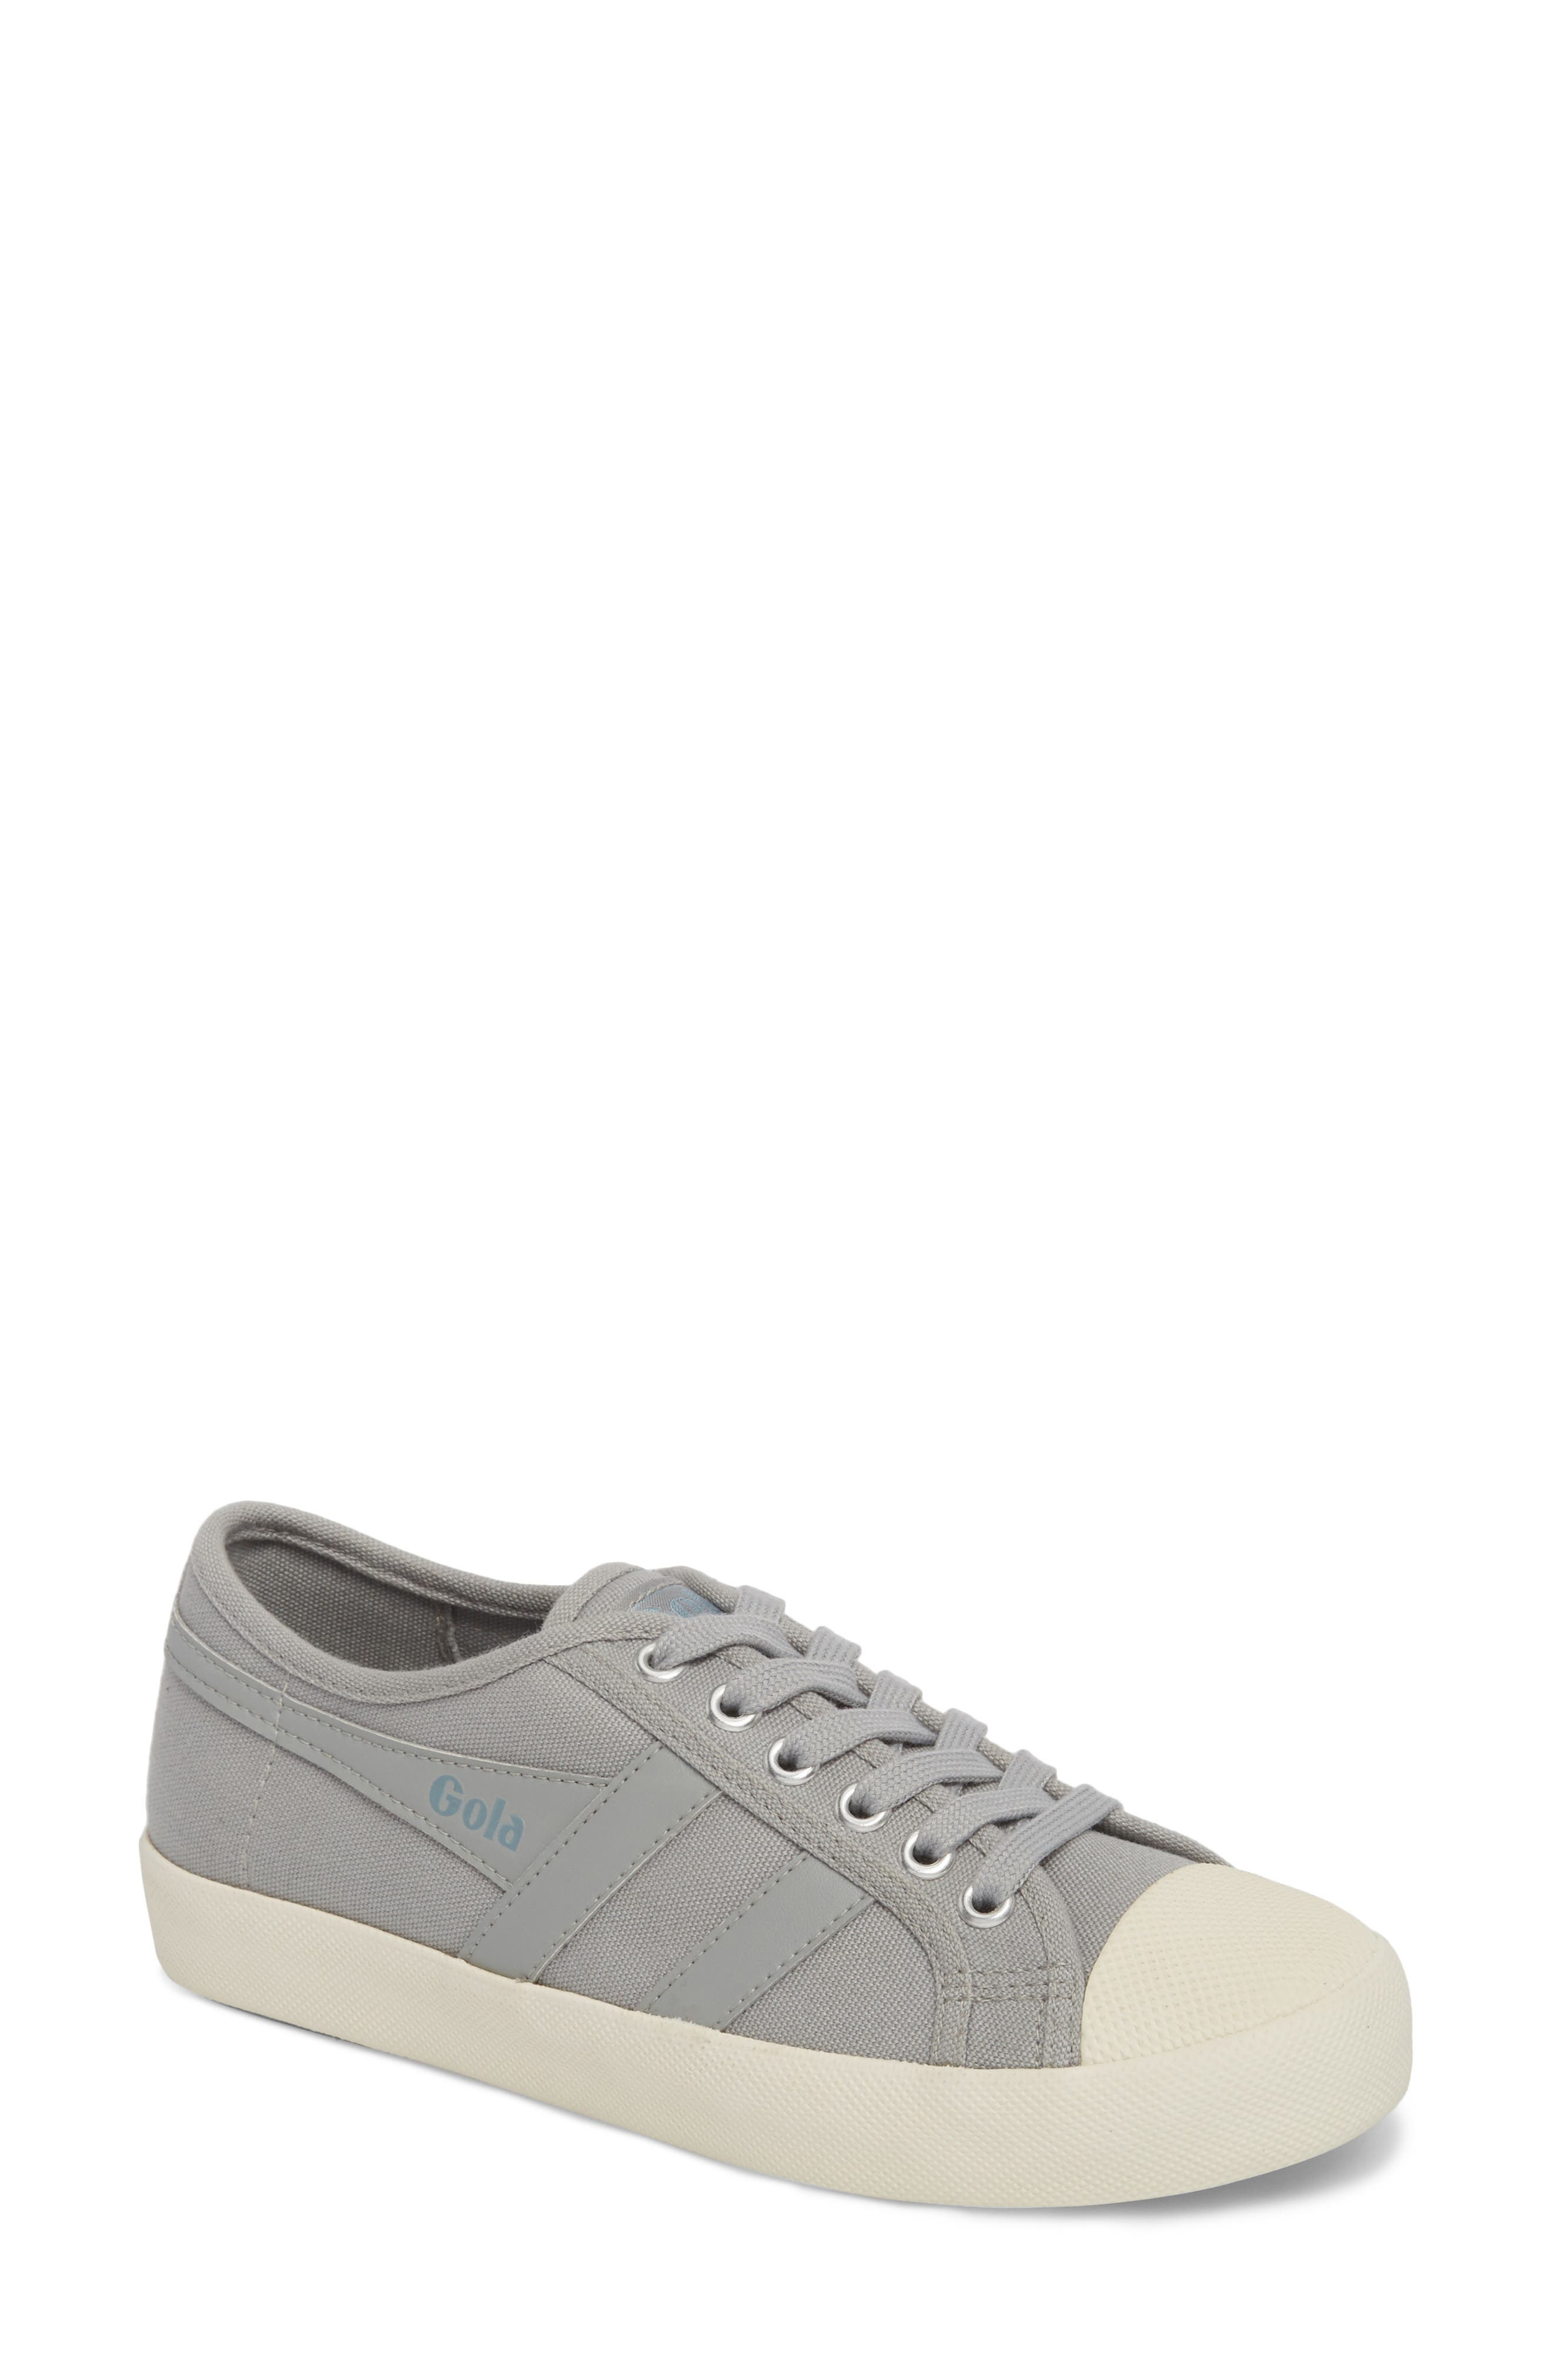 Coaster Sneaker,                             Main thumbnail 1, color,                             Paloma/ Off White